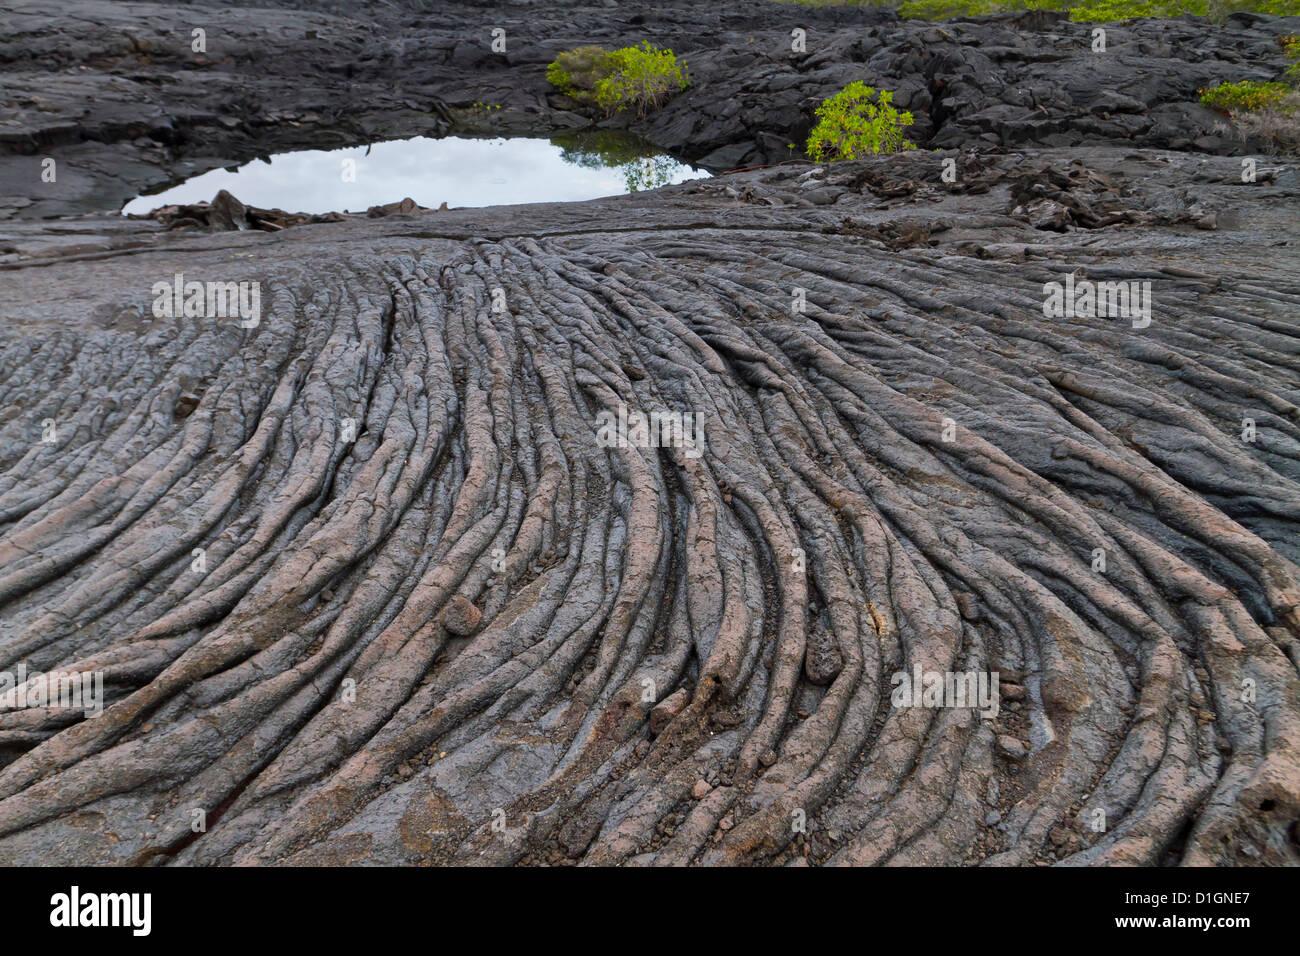 Lava flow, Fernandina Island, Galapagos Islands, UNESCO World Heritage Site, Ecuador, South America - Stock Image